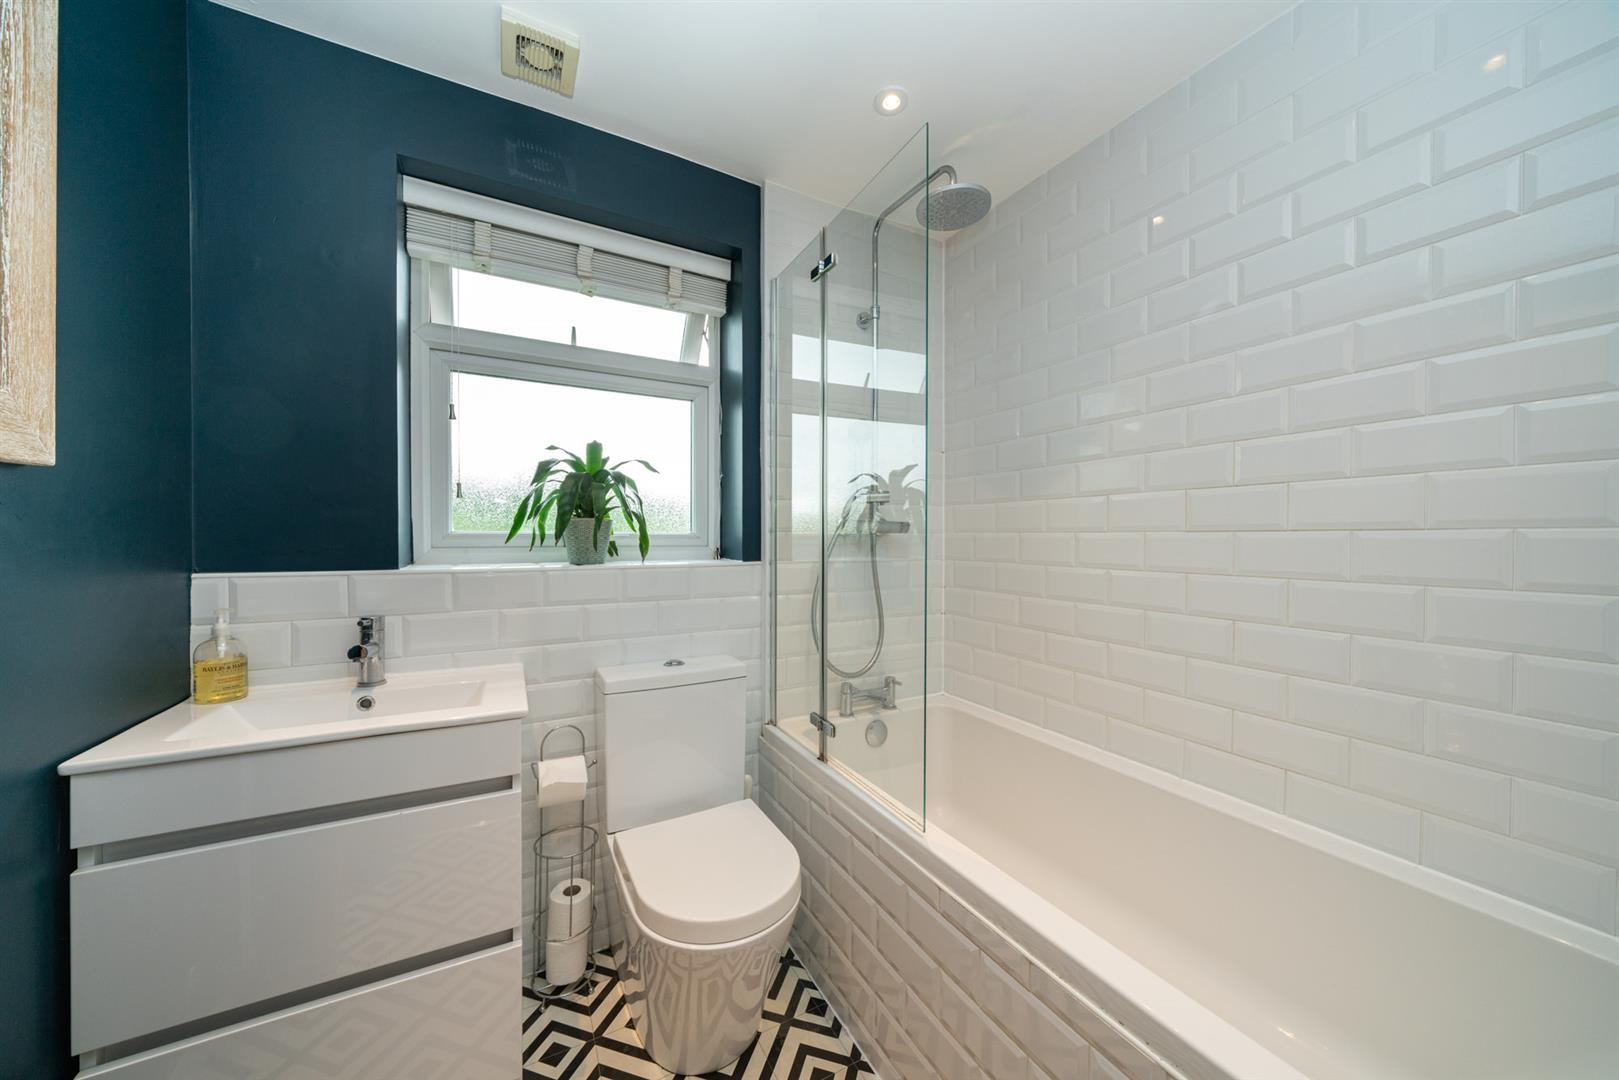 21-Swing-gate-lane-0672 - bathroom.jpg